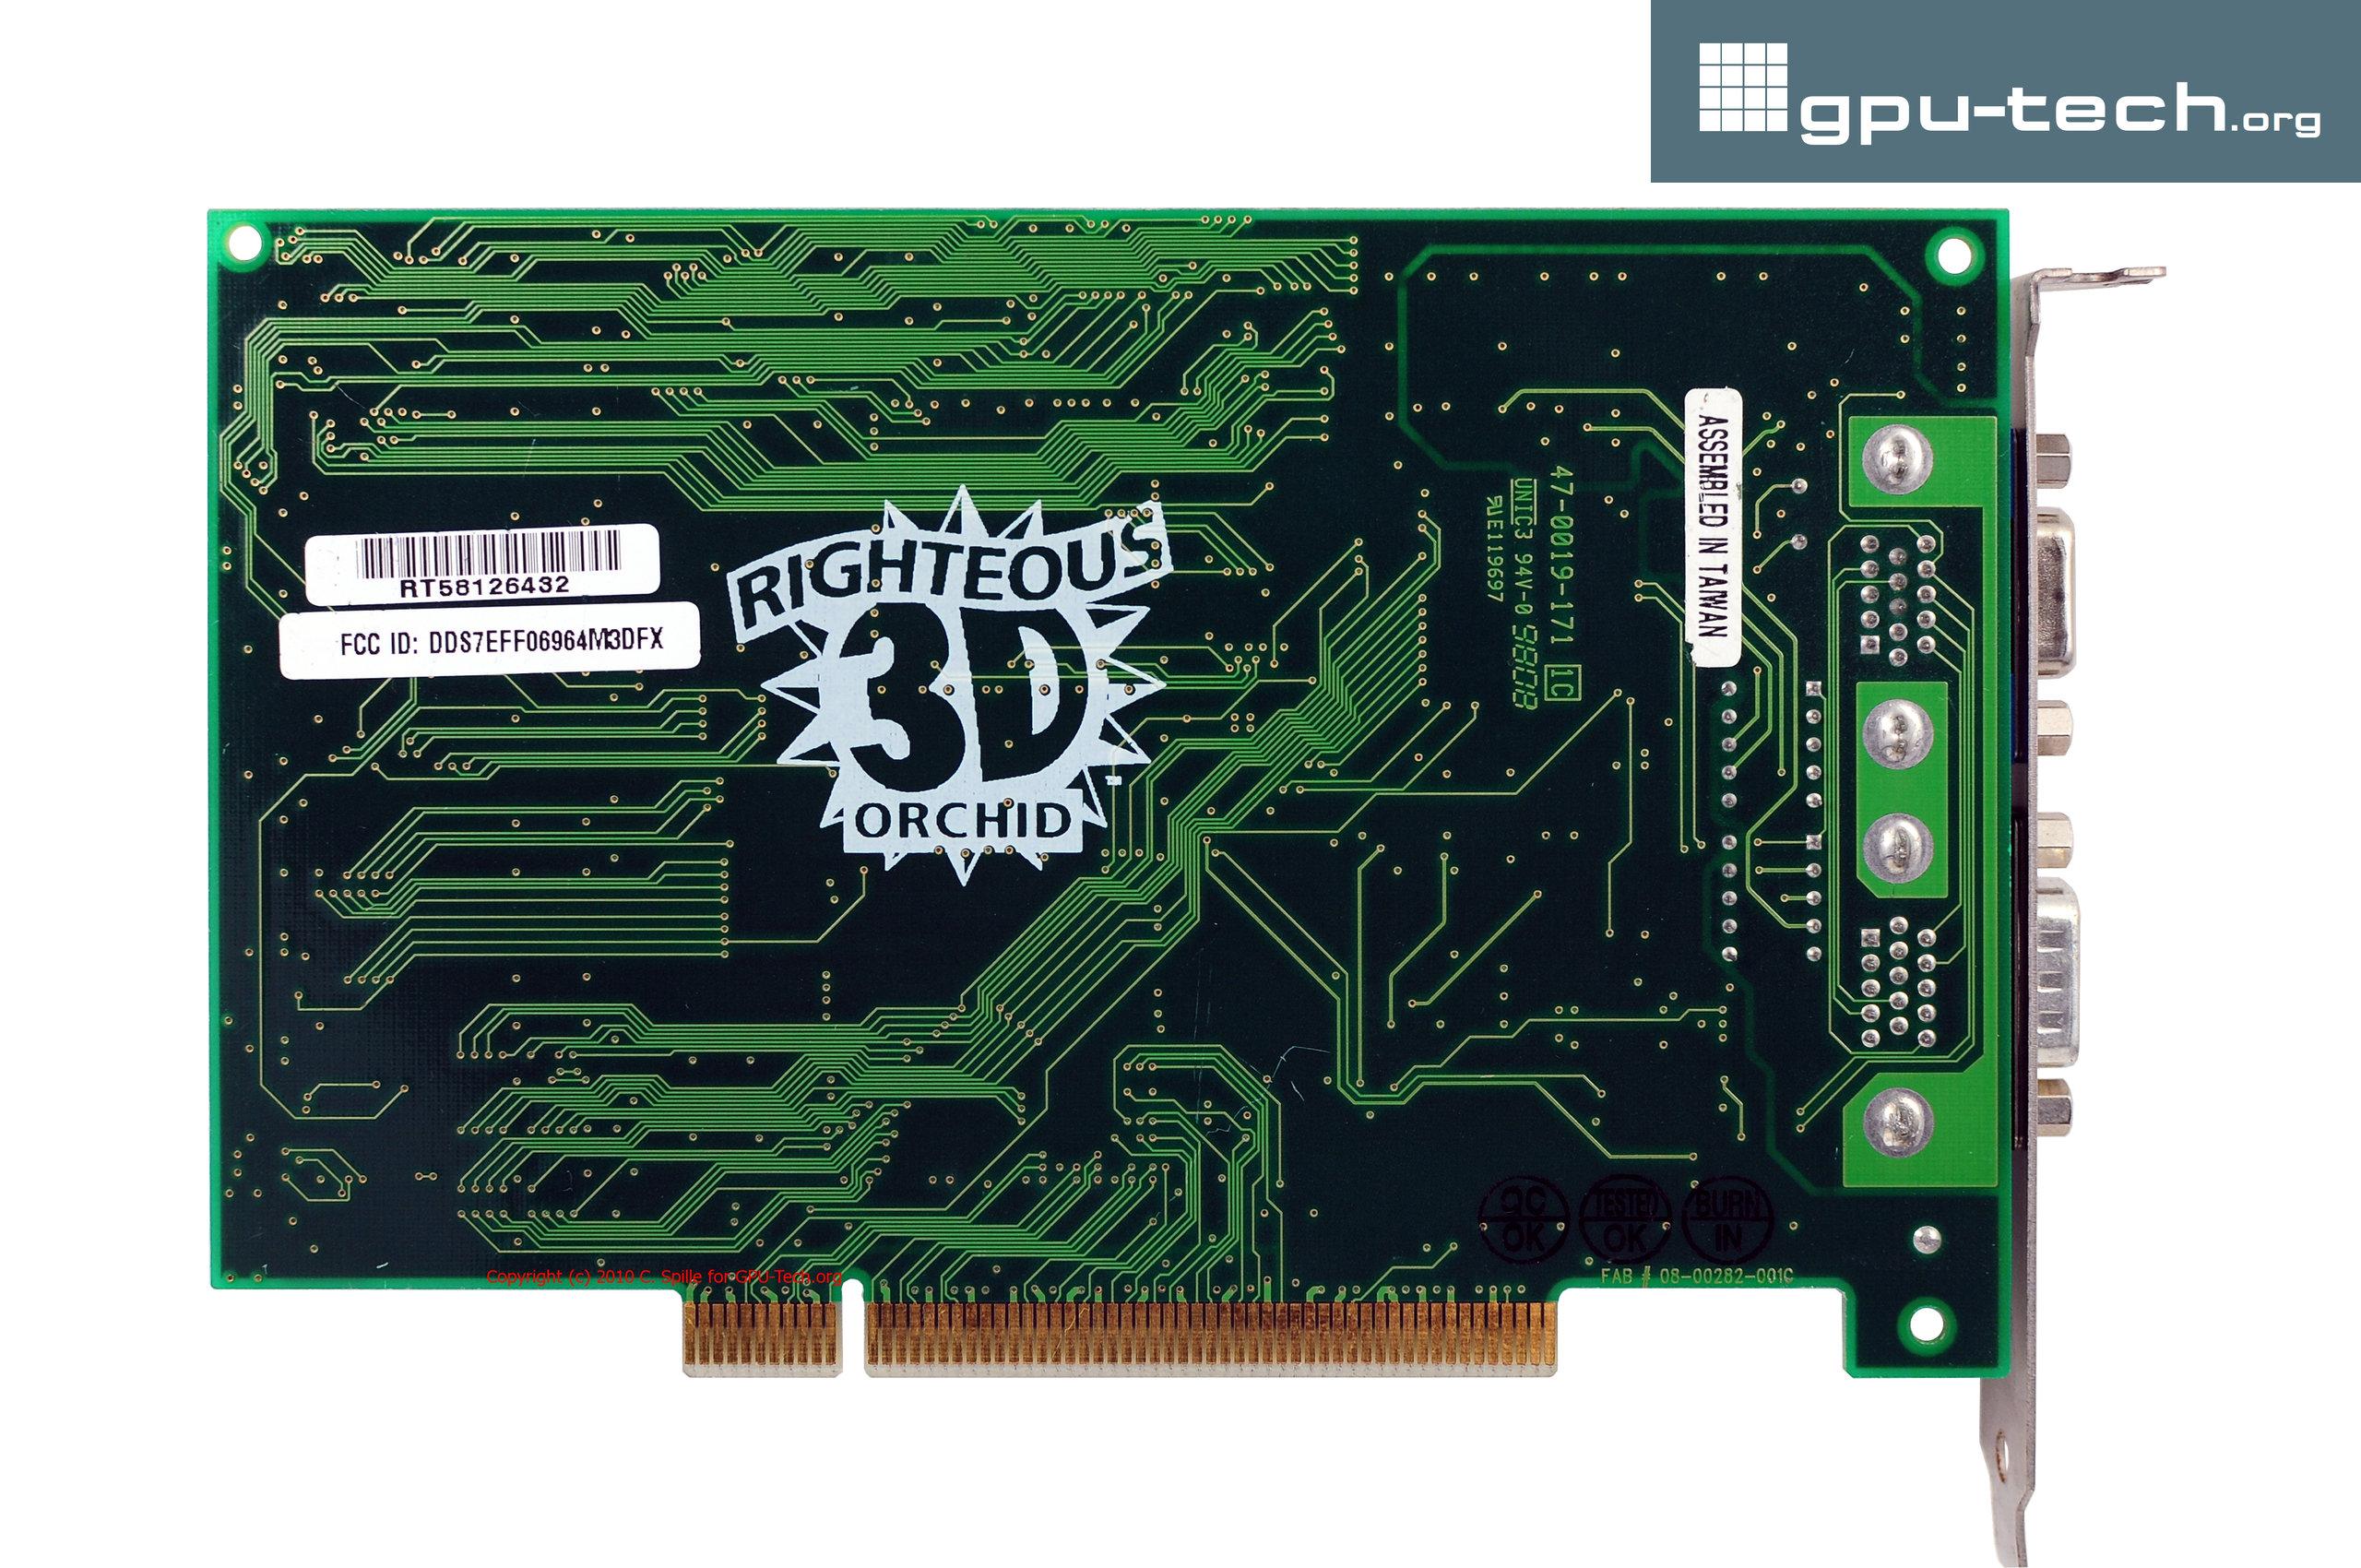 3Dfx Voodoo Graphics: Orchid Righteous 3D (back view)